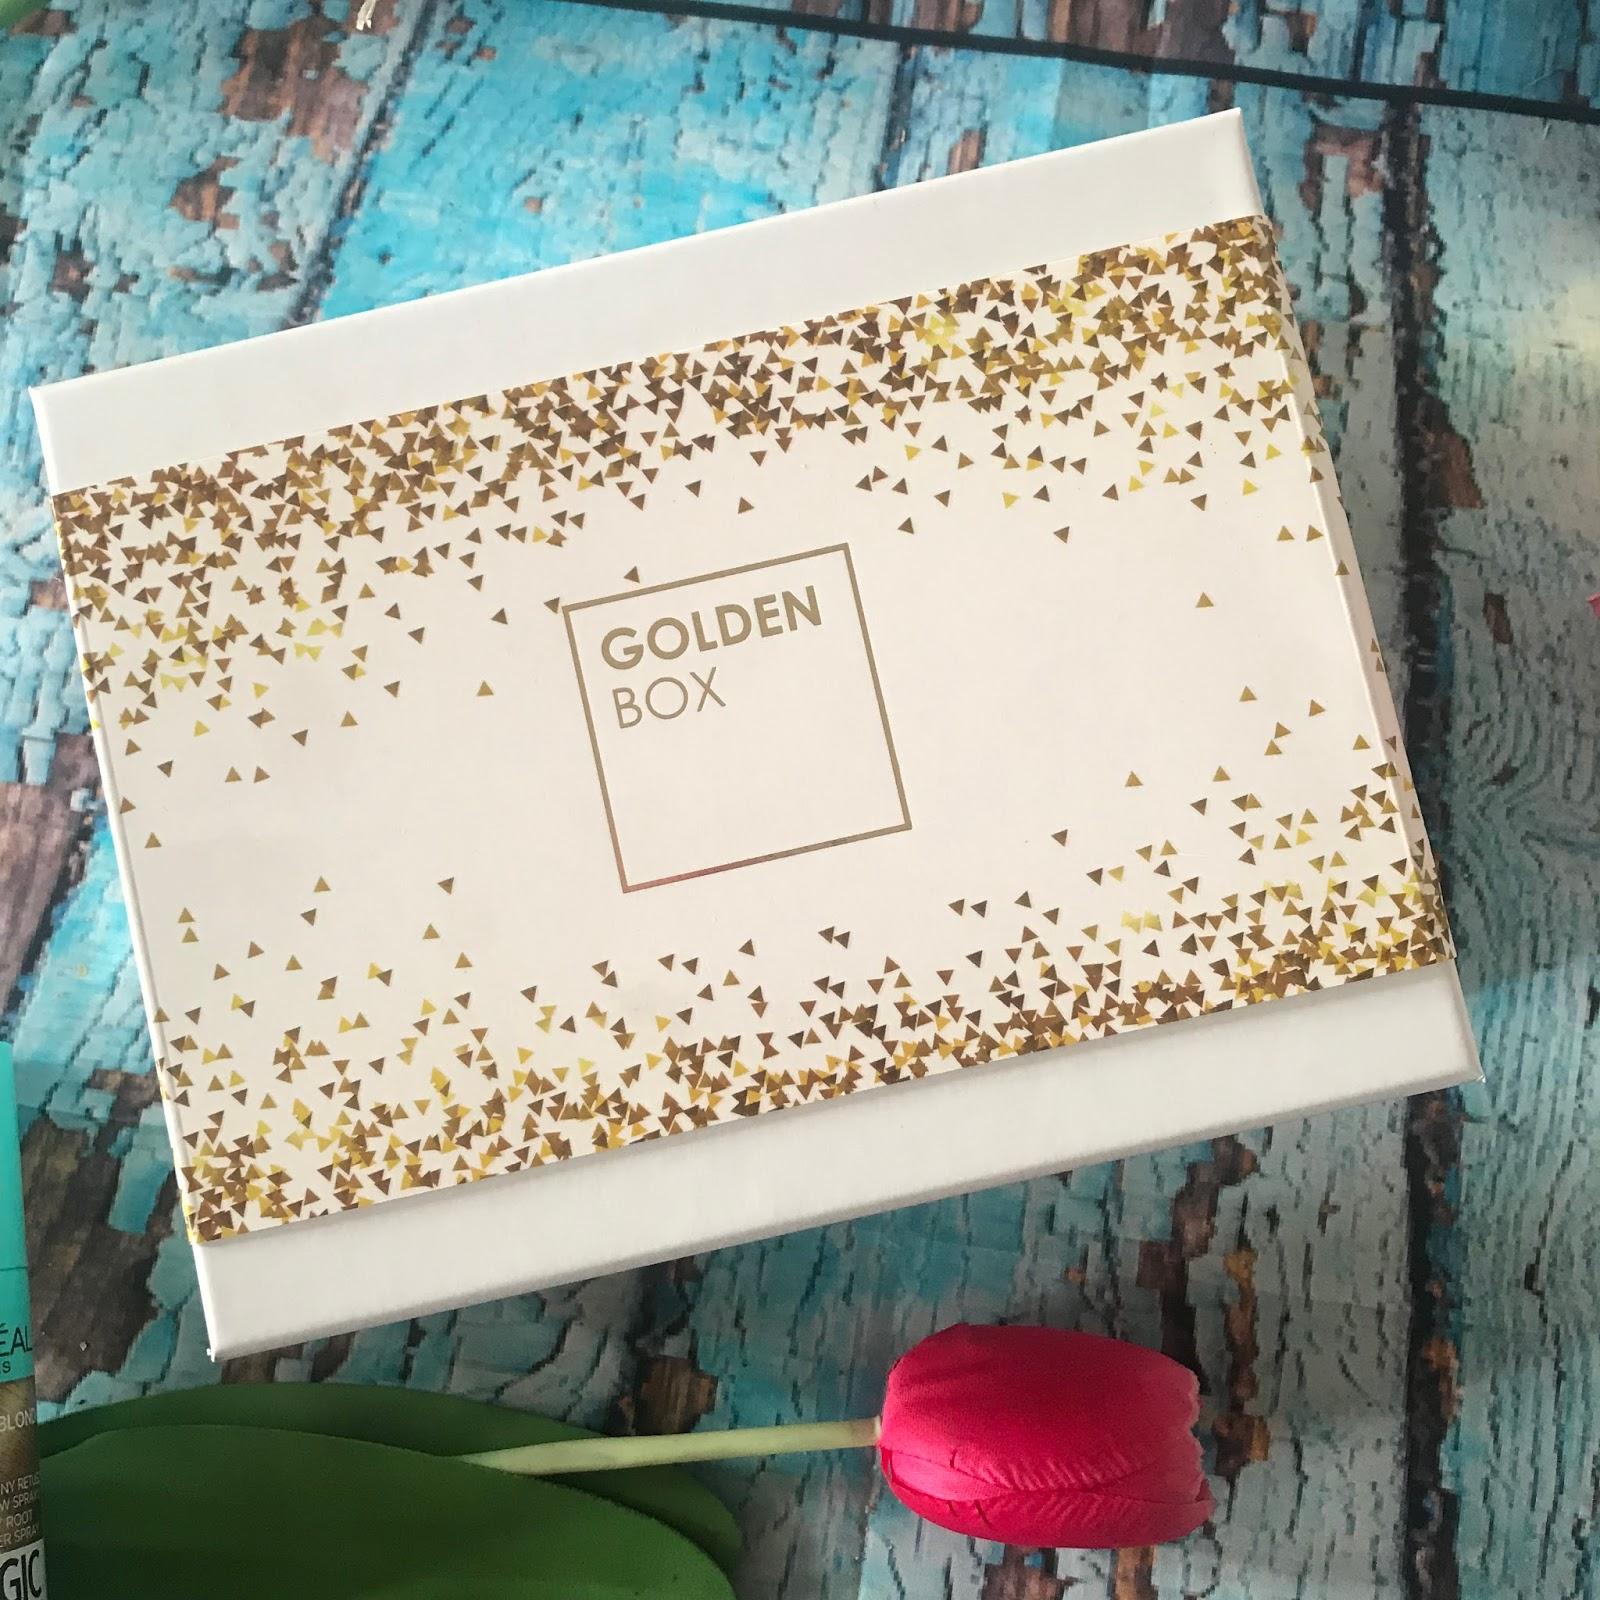 Golden Box Przegląd pudełka no. 4